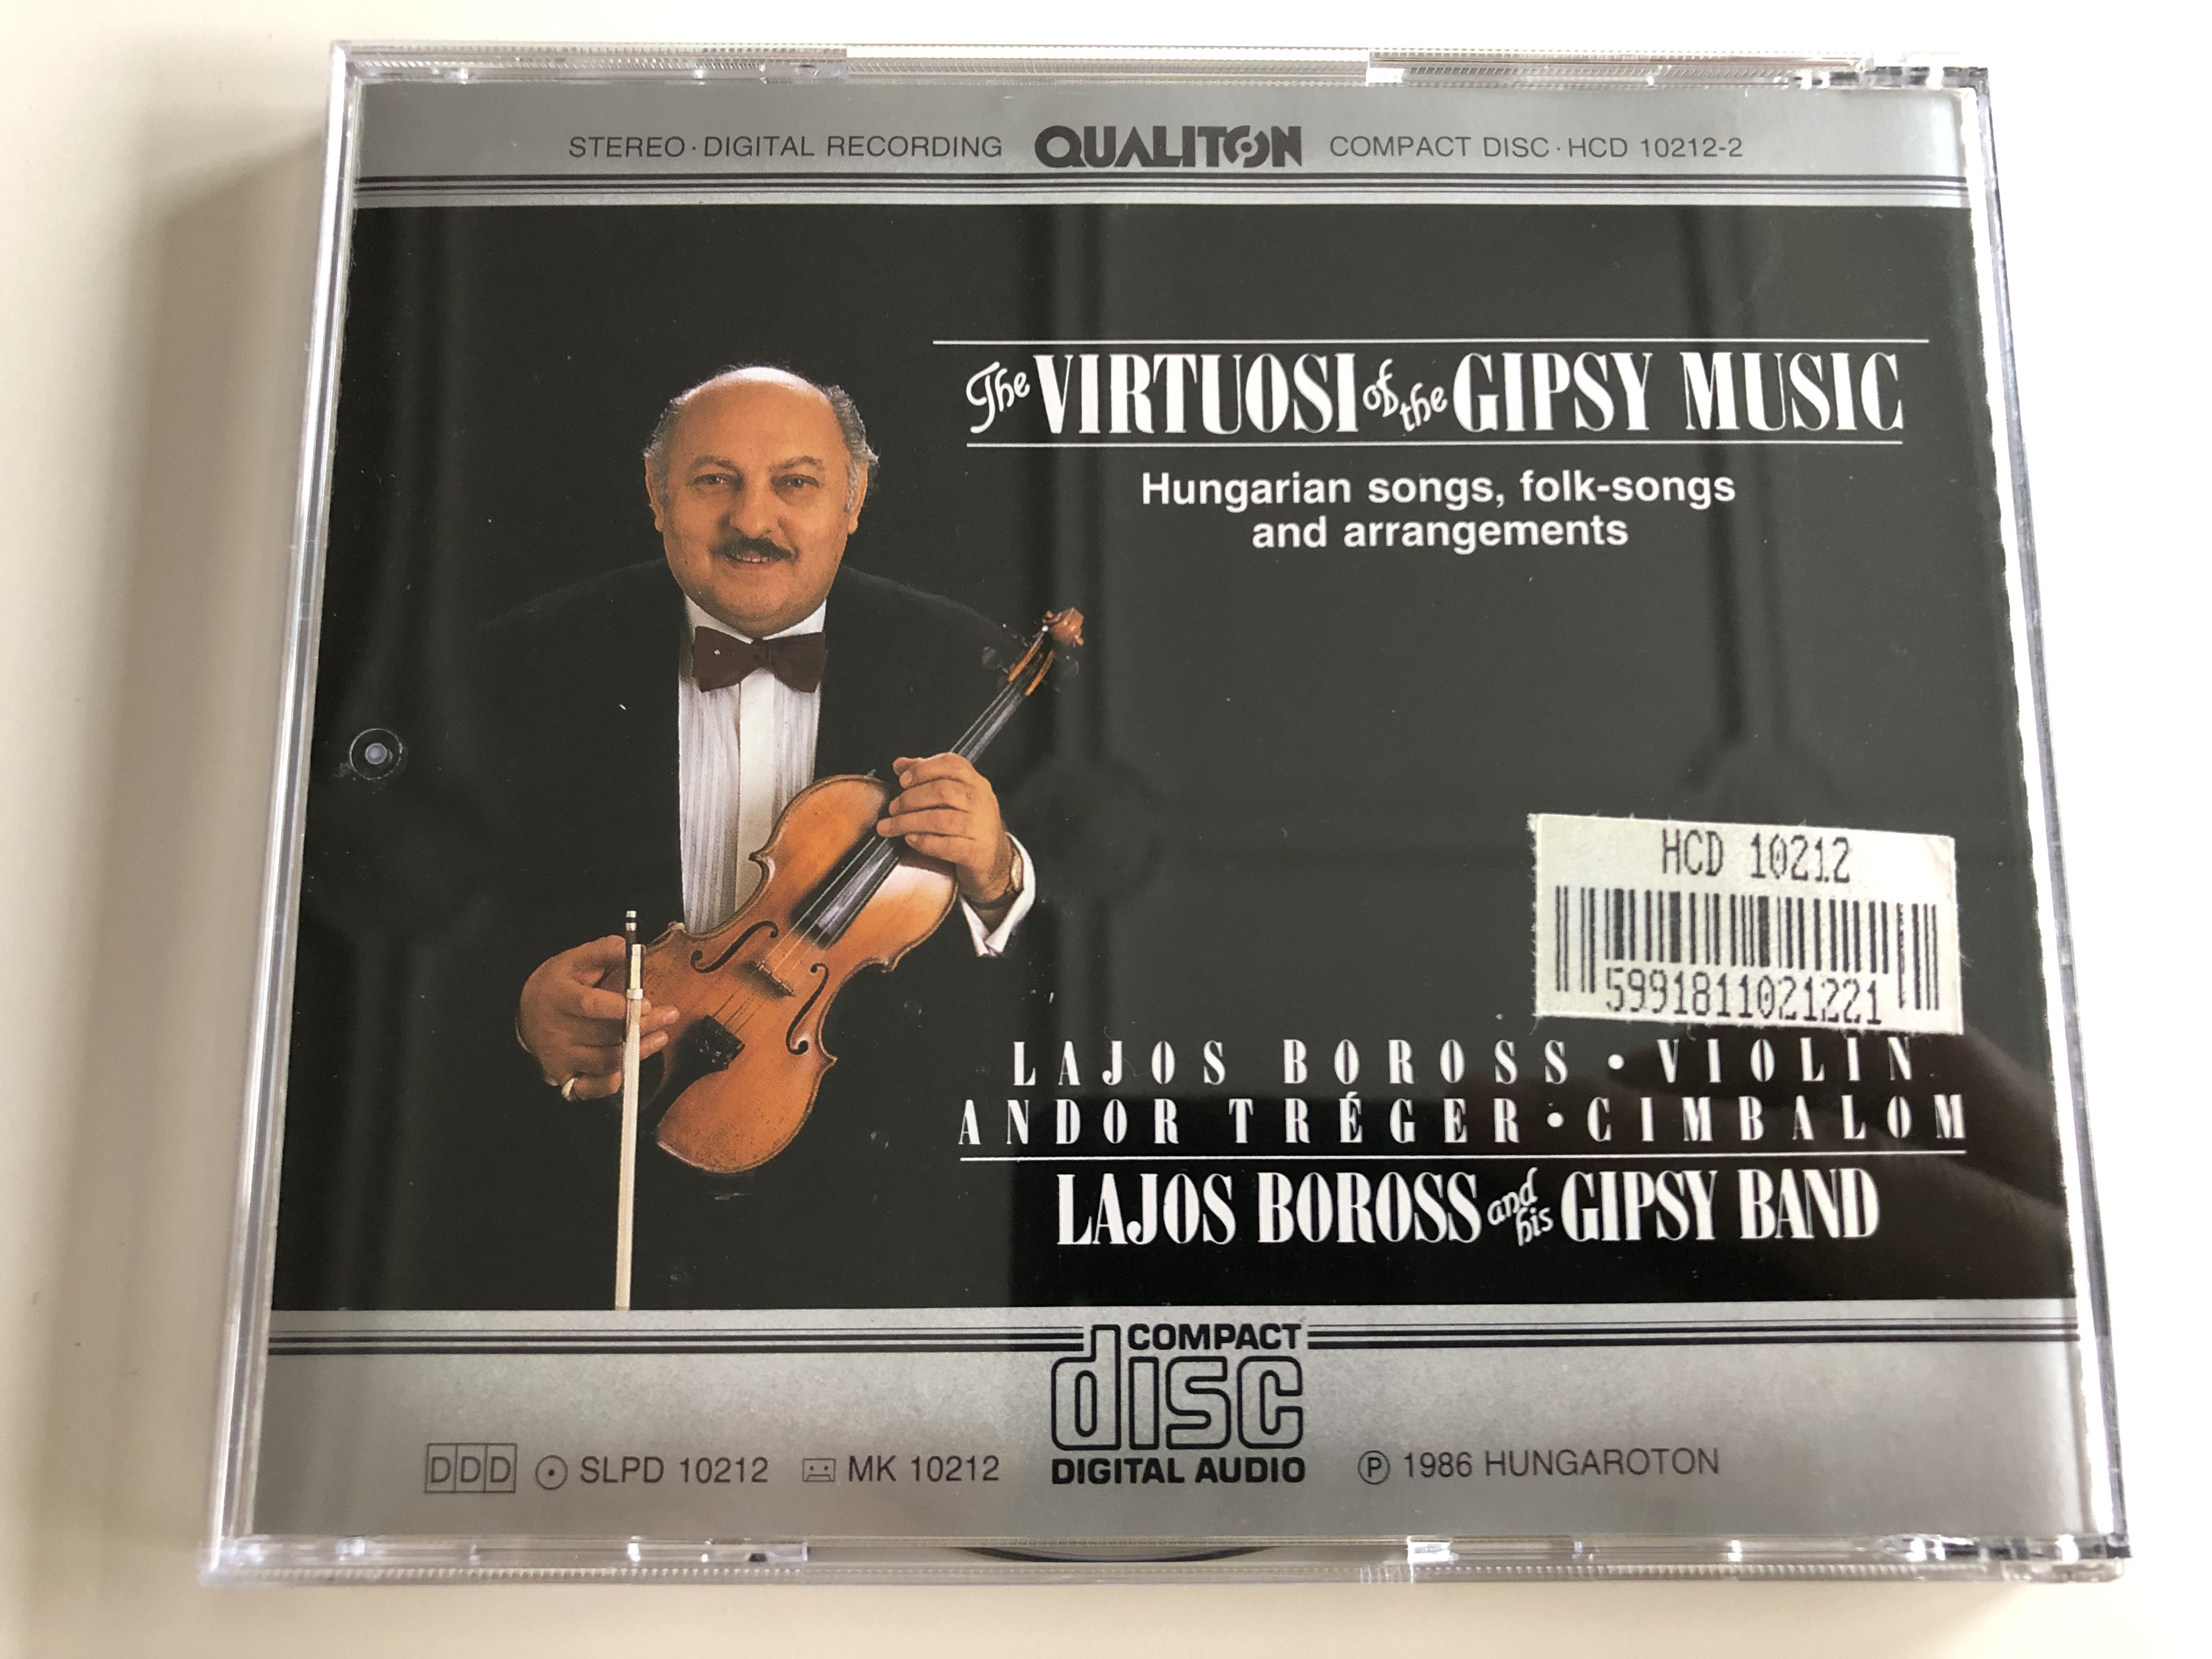 lajos-boross-and-his-gipsy-band-audio-cd-lajos-boross-violin-andor-tr-ger-cymbalo-the-virtuosi-of-the-gipsy-music-hungarian-songs-folk-songs-and-arrangements-qualiton-hcd-10212-2-7-.jpg